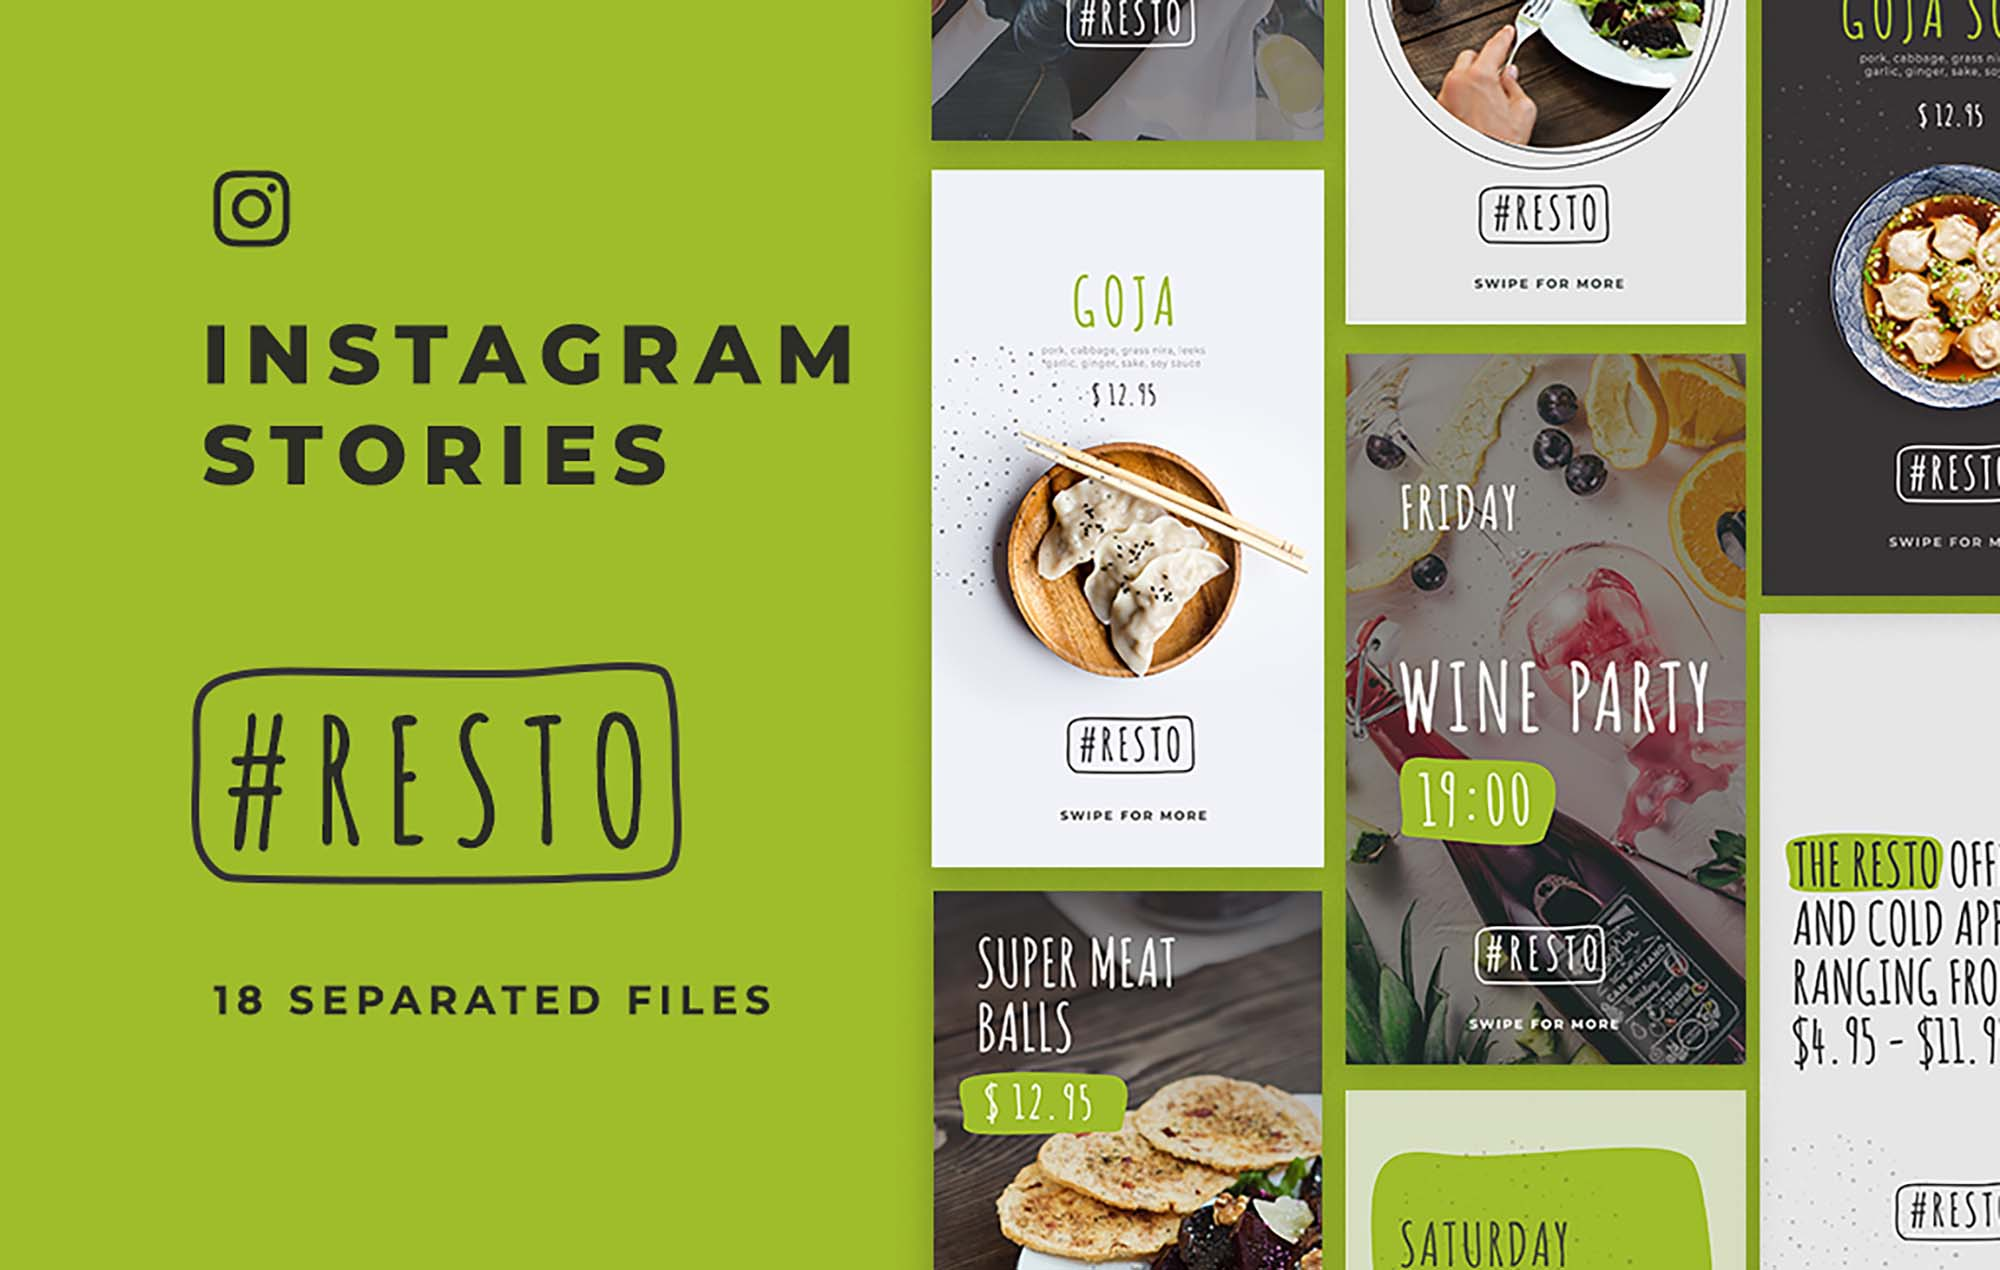 Resto Instagram Stories Template